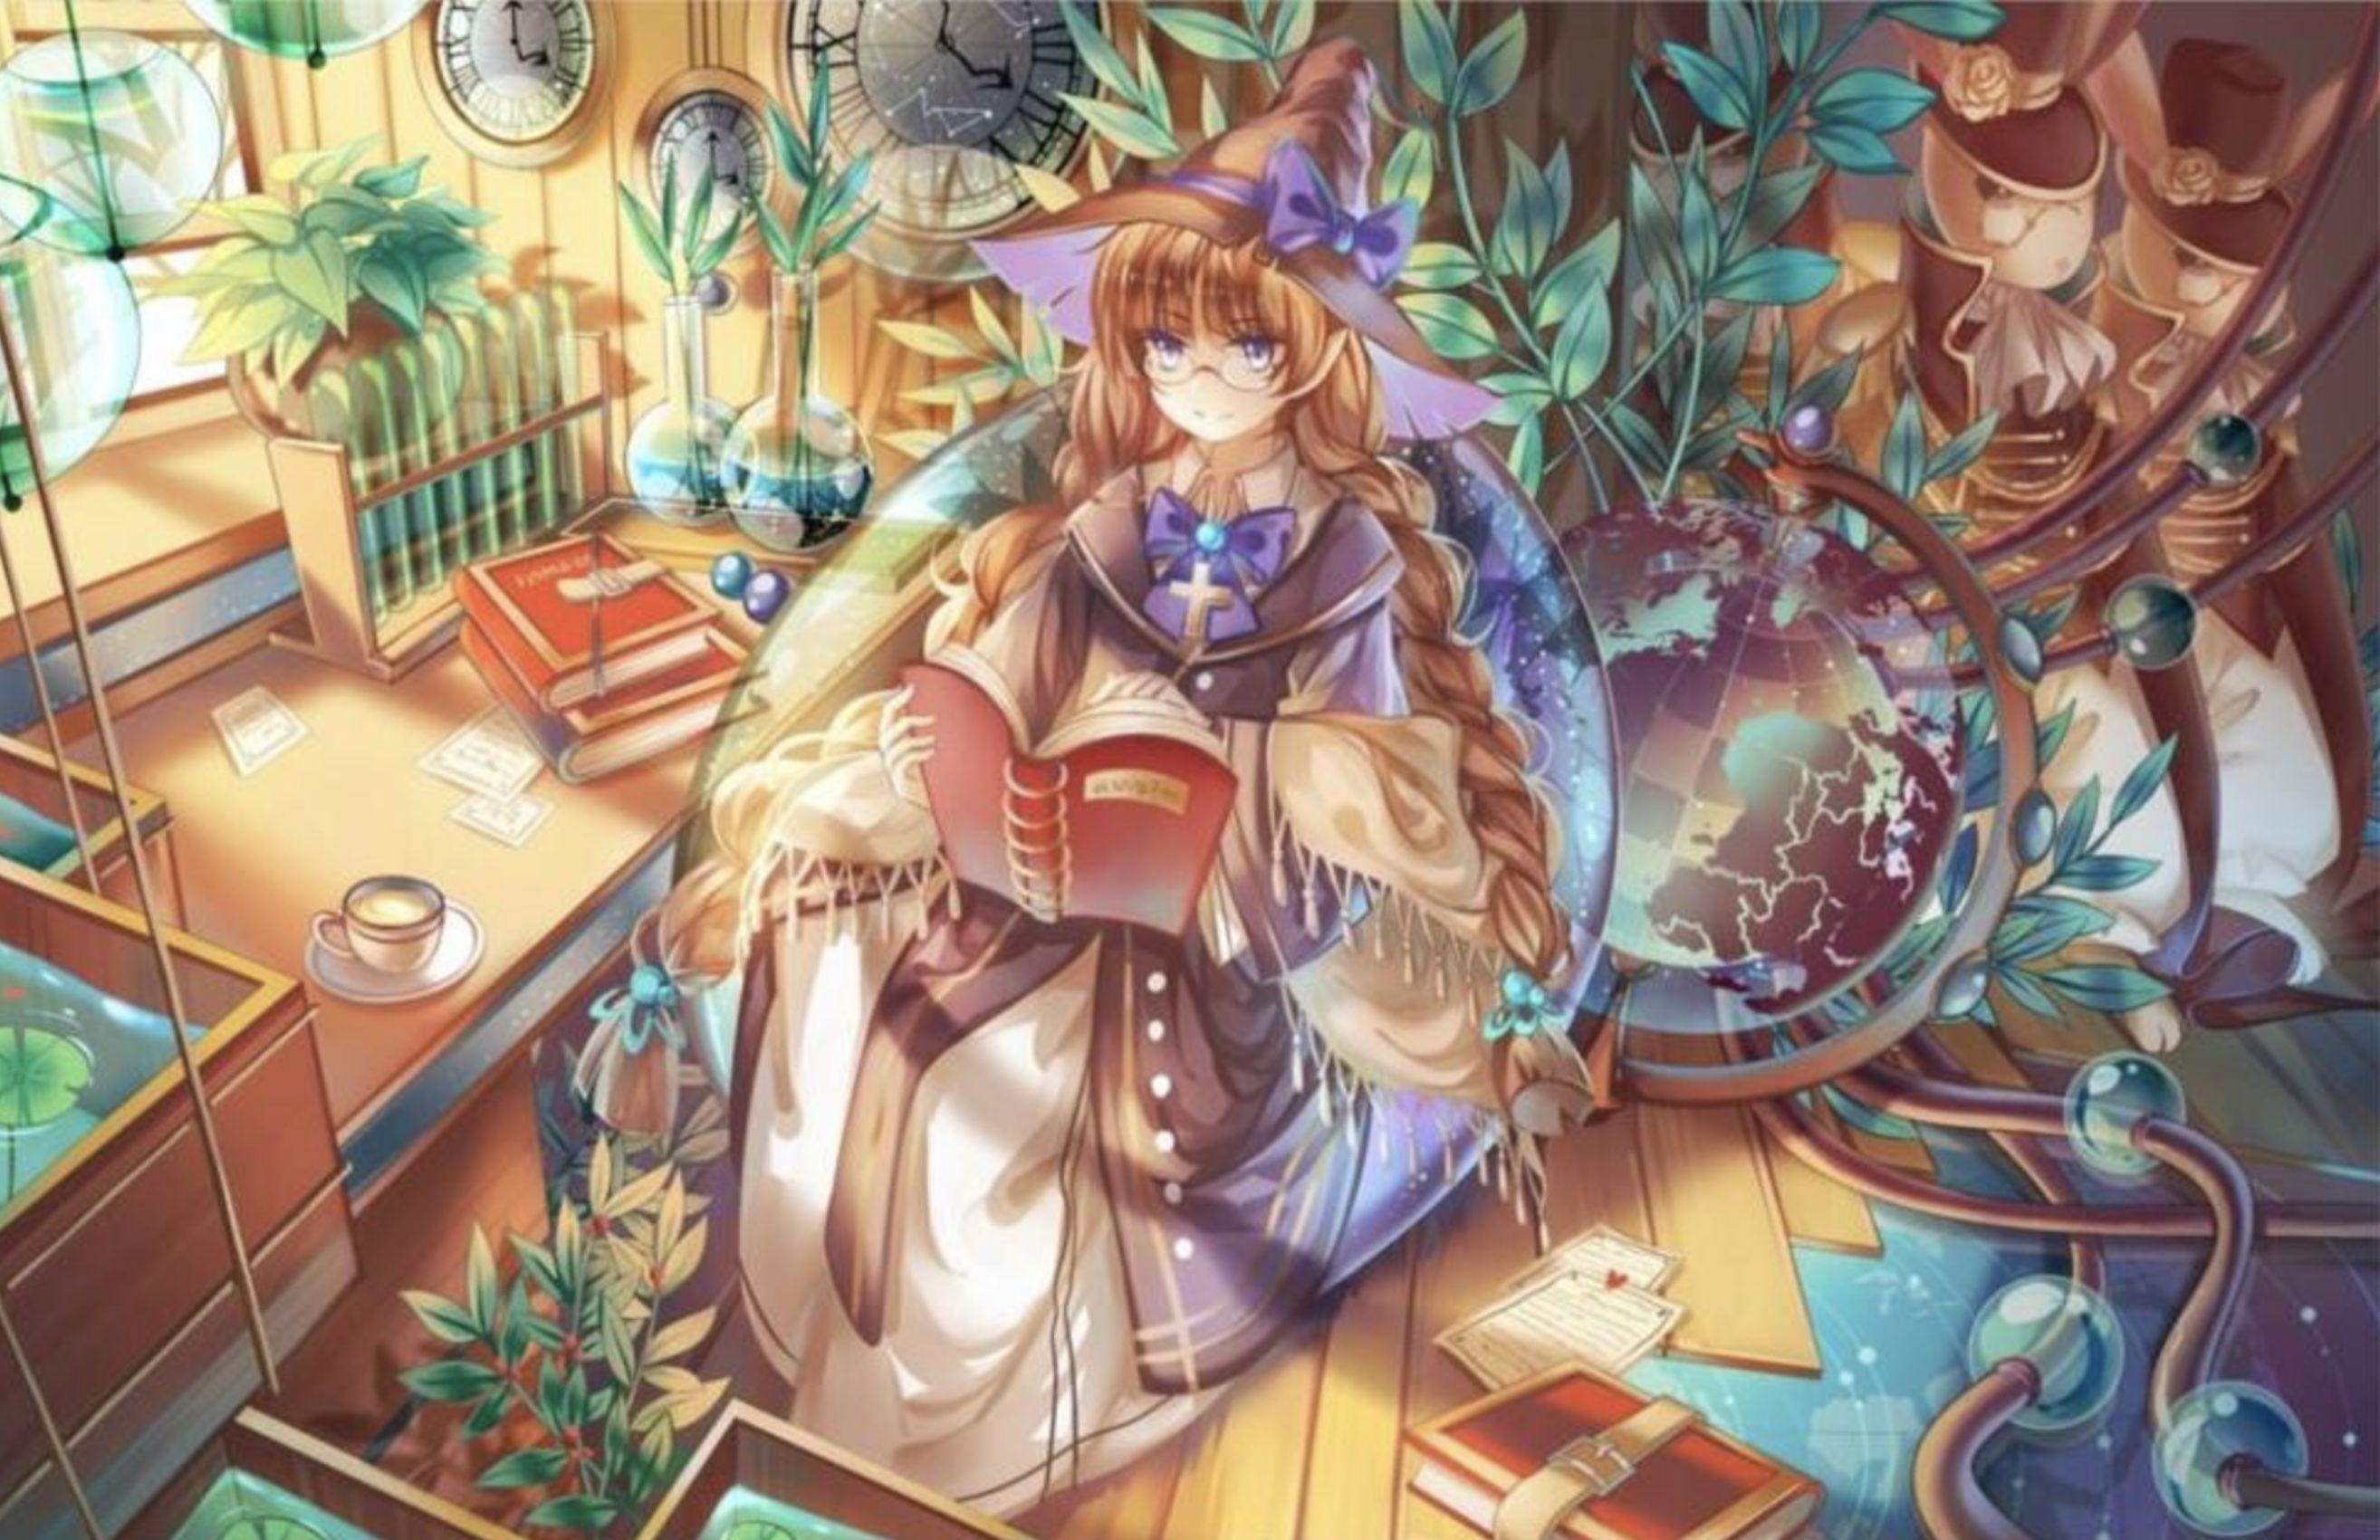 Anime wizard reading probably wizard manga anime art